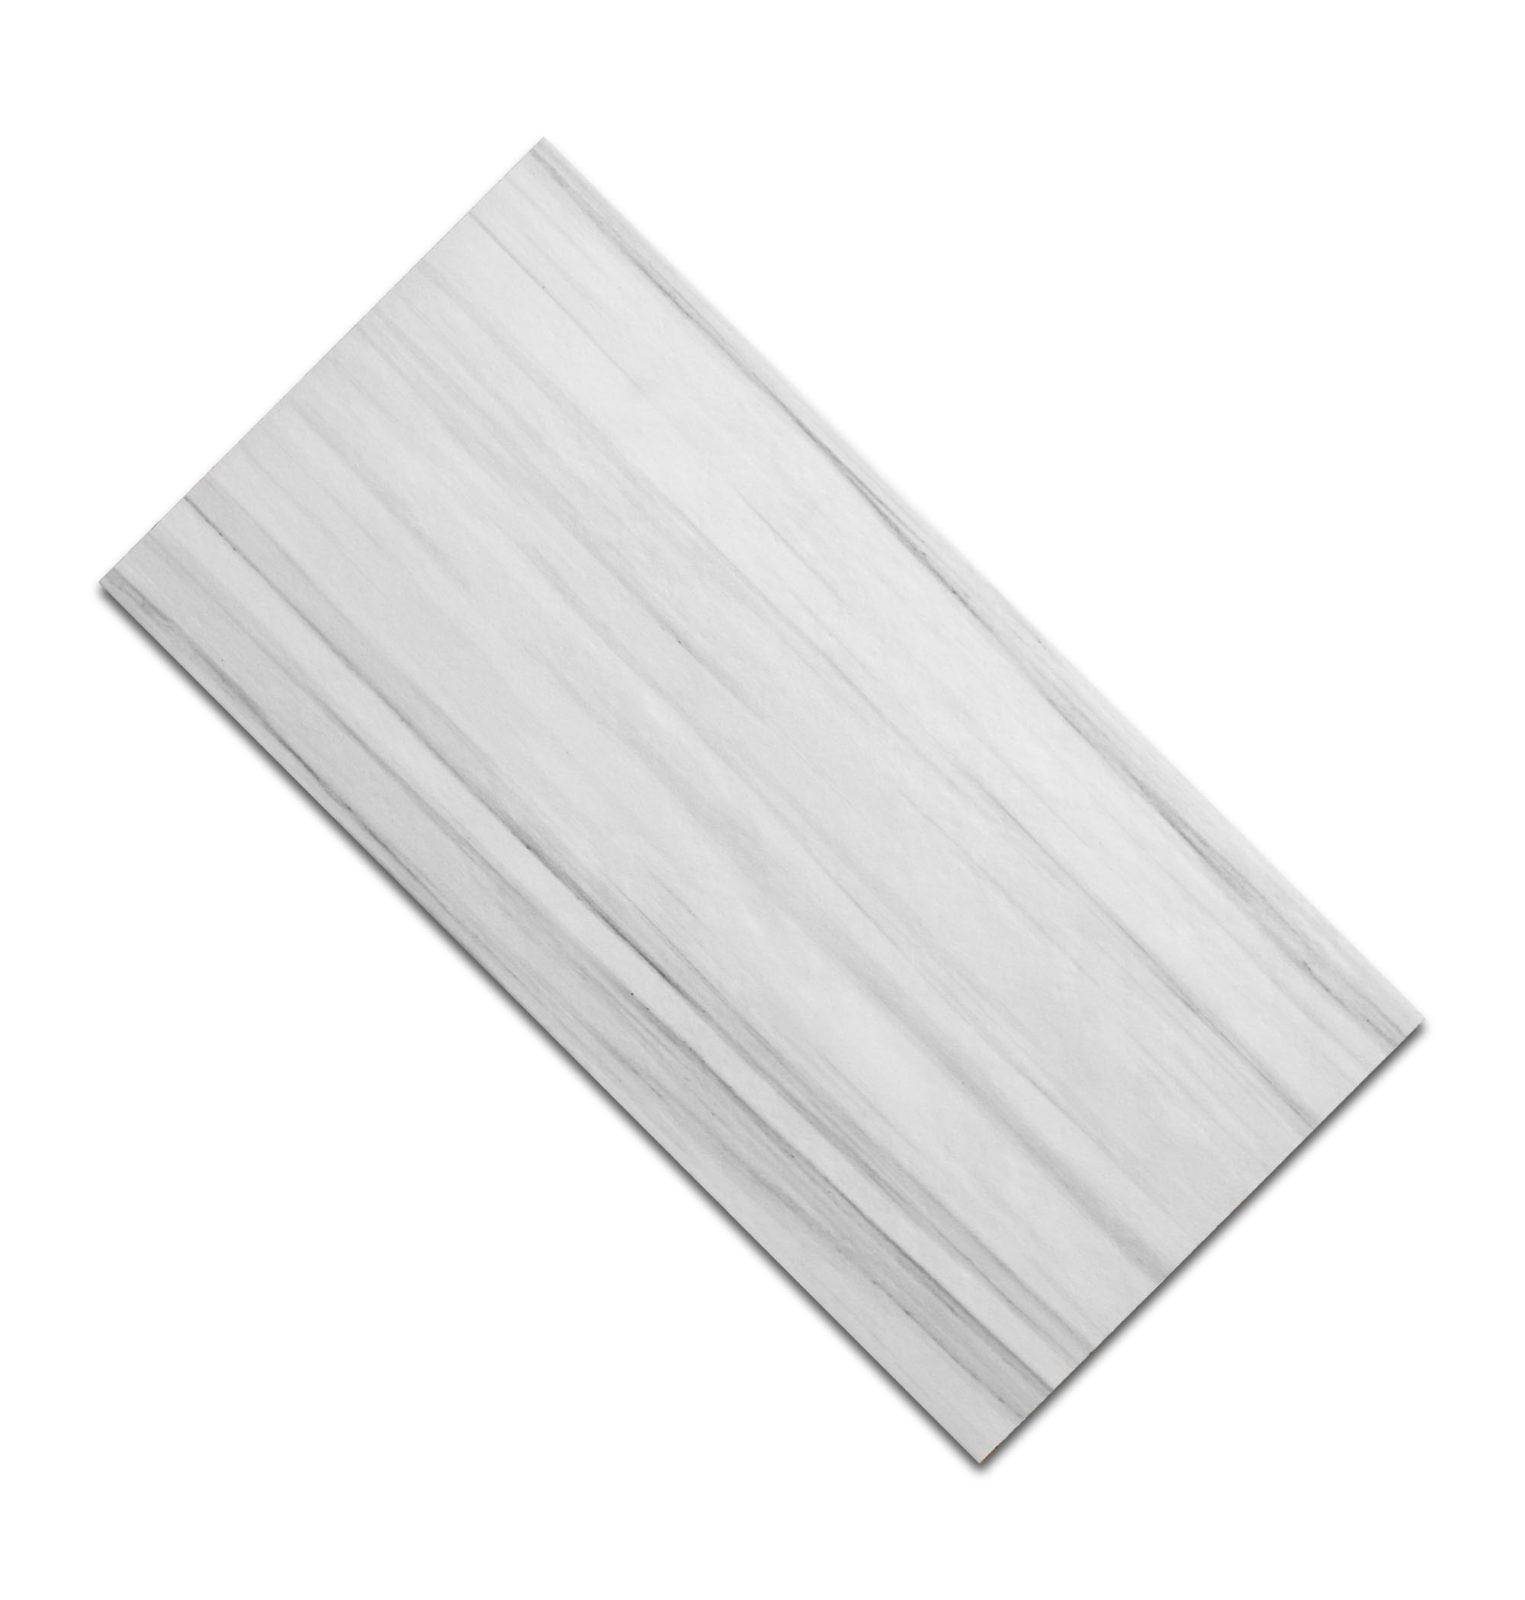 Interceramic contour zebrino ceramic tile 12 x 24 schillings interceramic contour zebrino ceramic tile 12 x 24 dailygadgetfo Image collections